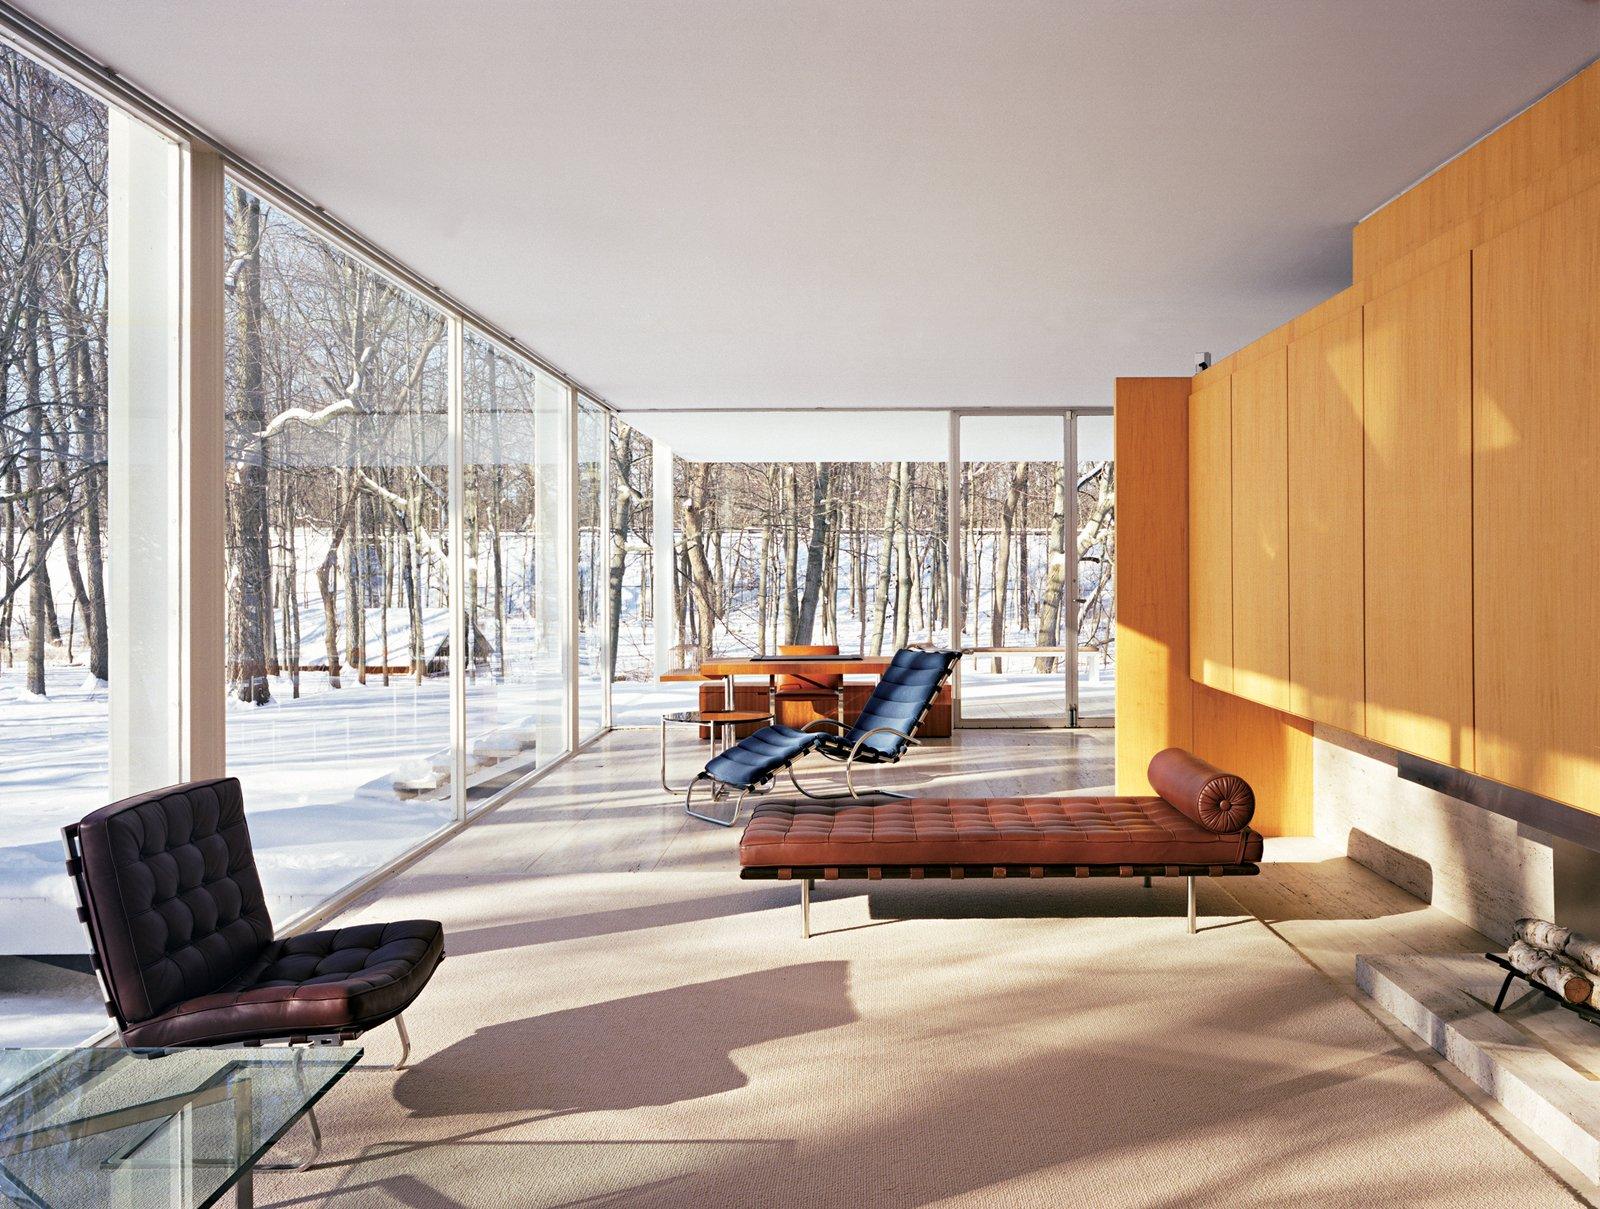 Facade Architecture House Classic